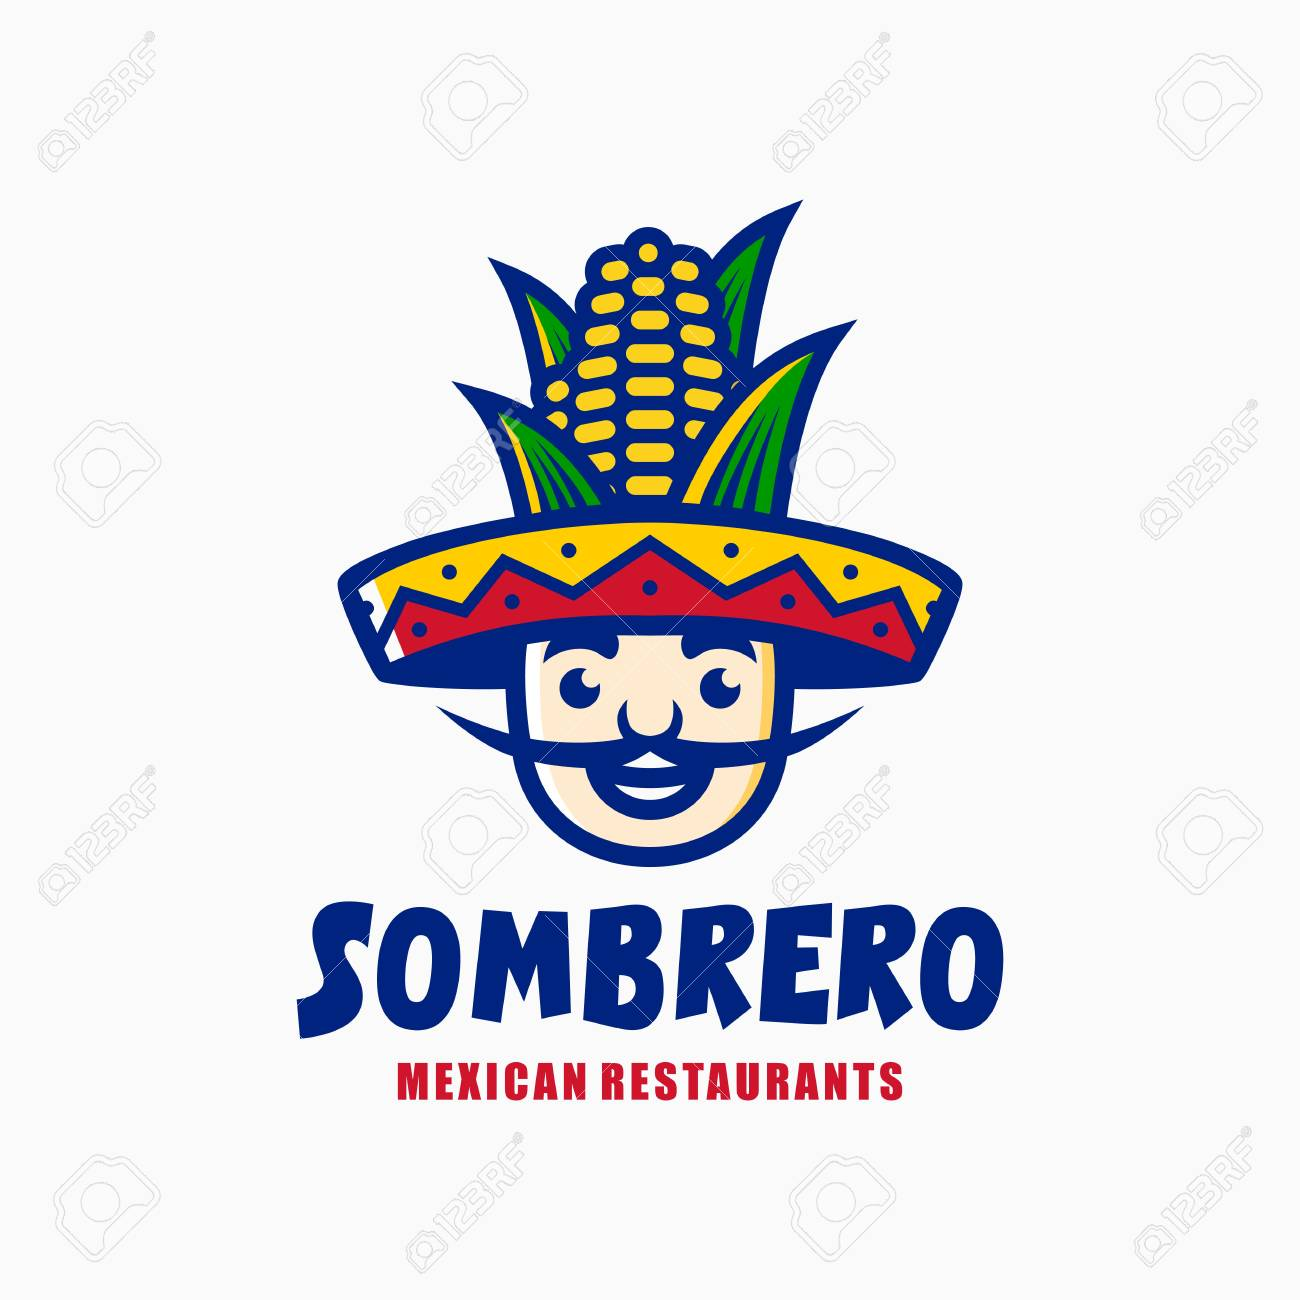 sombrero hat corn mexican restaurant logo mascot character cartoon  illustration Stock Vector - 107801147 7530eb5a3ad